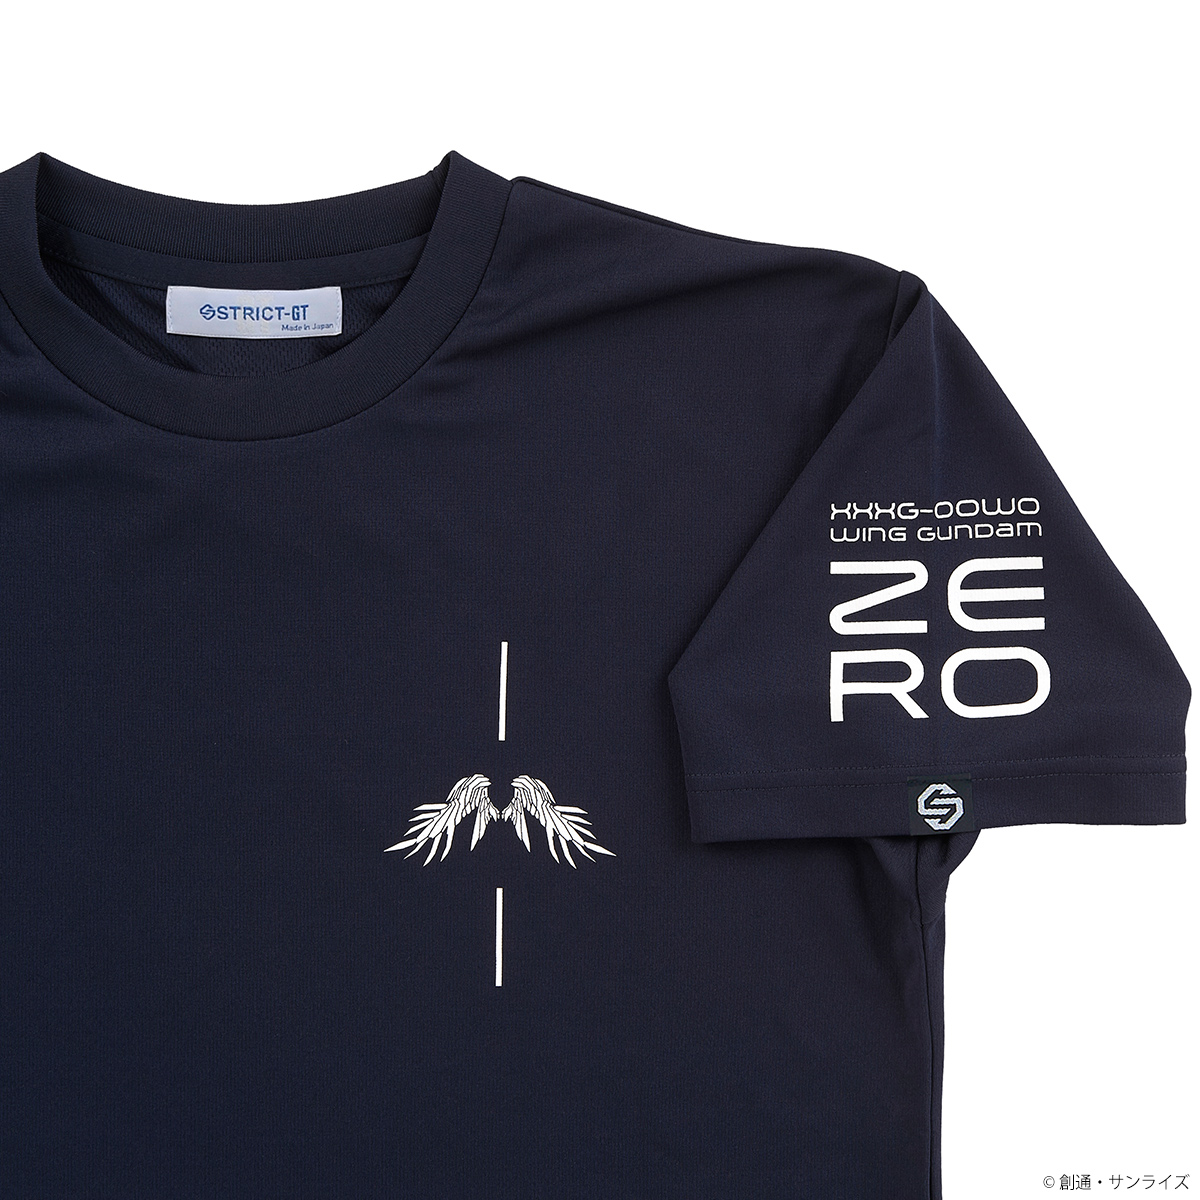 Wing Gundam Zero Quick-Drying T-shirt—Mobile Suit Gundam Wing/STRICT-G Collaboration